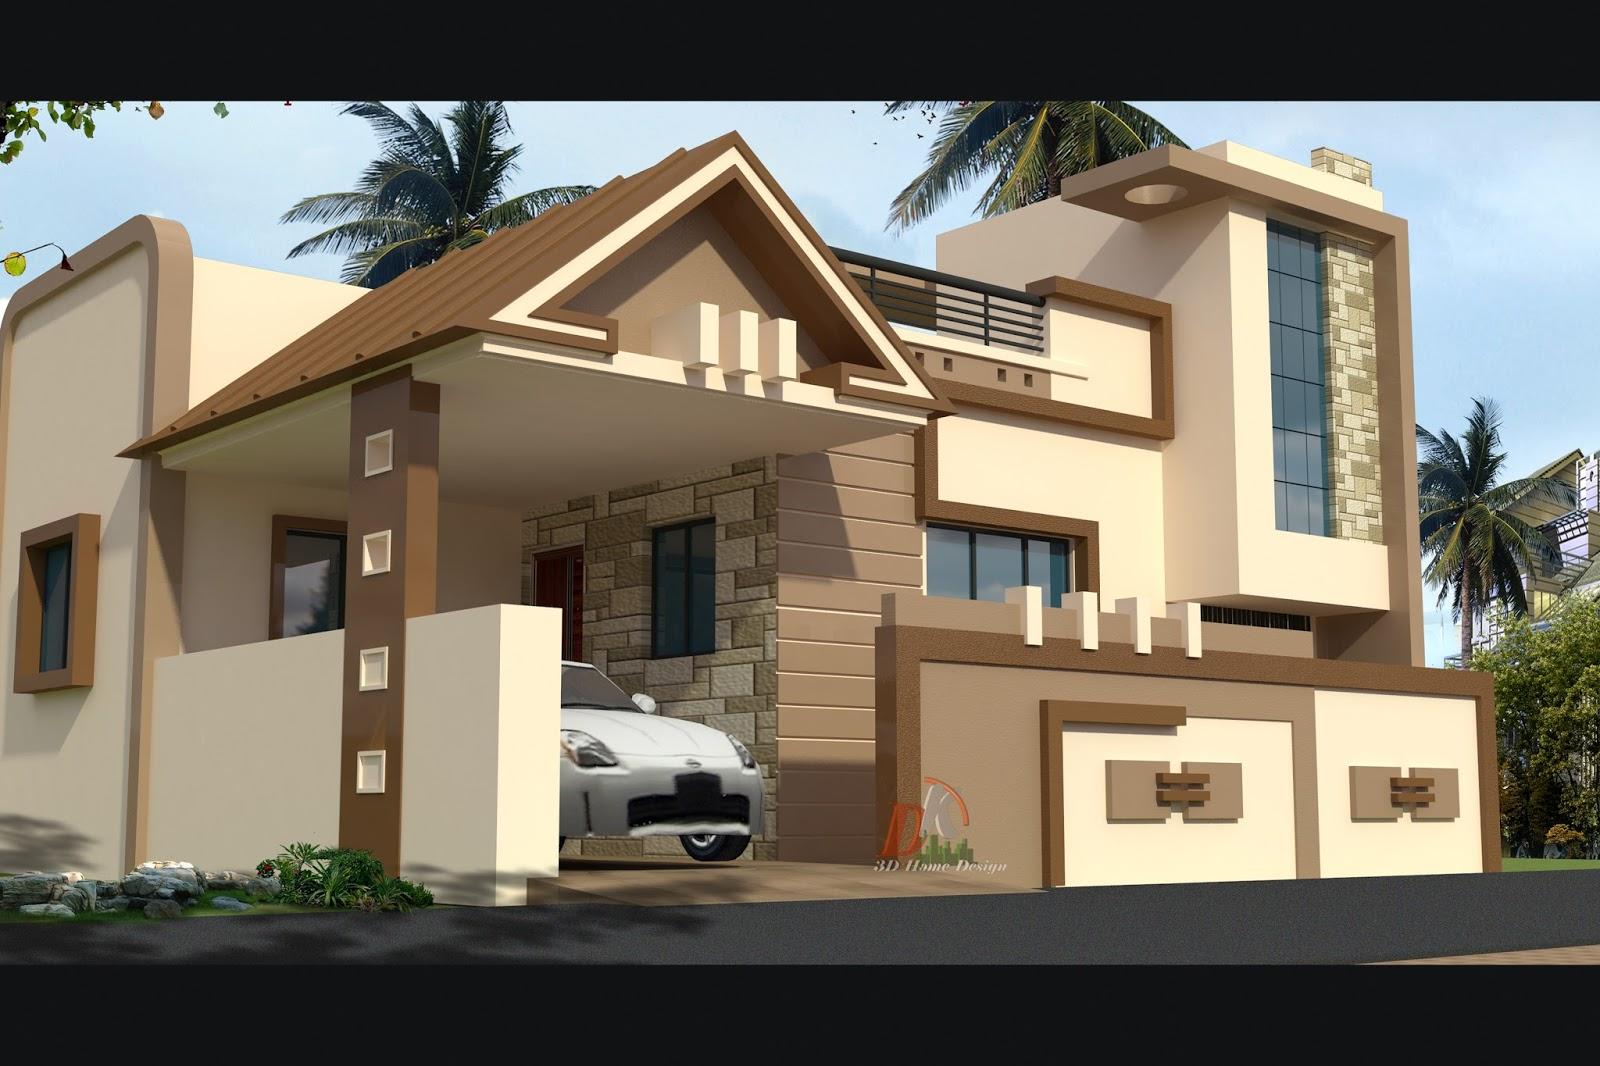 3d home design ground floor.  ground floor simple house